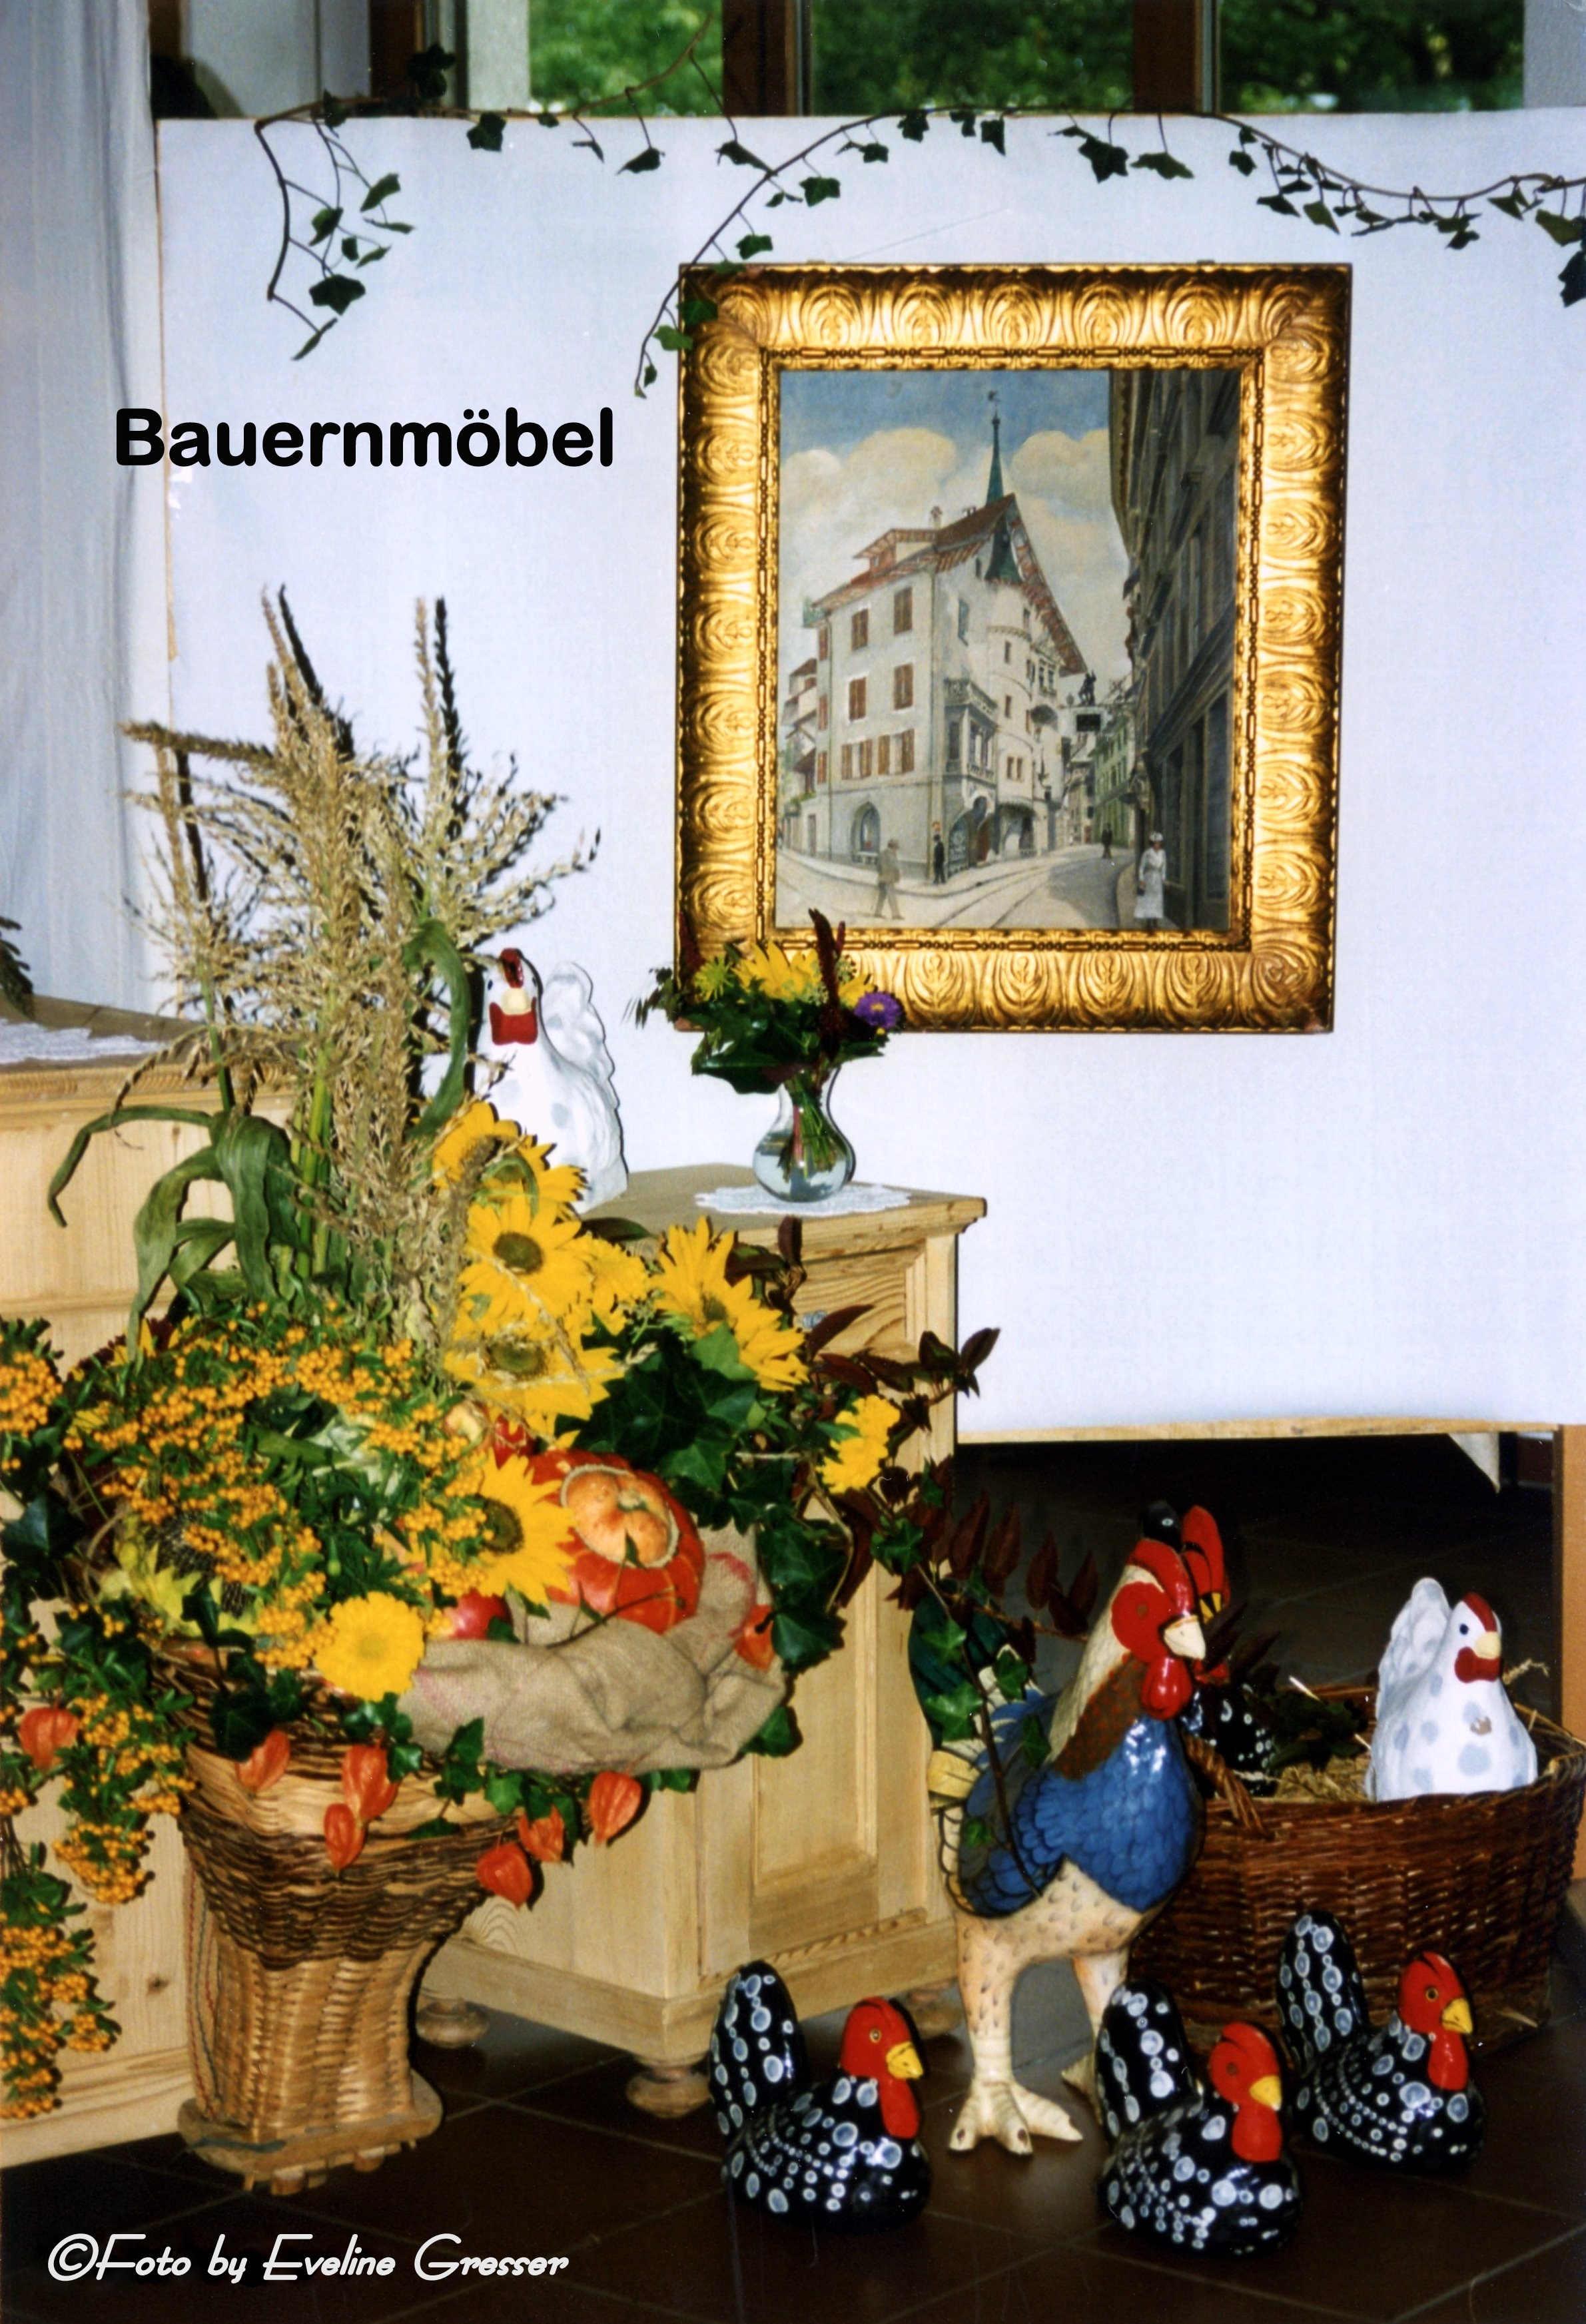 35StandBauernmöbel1850-1900